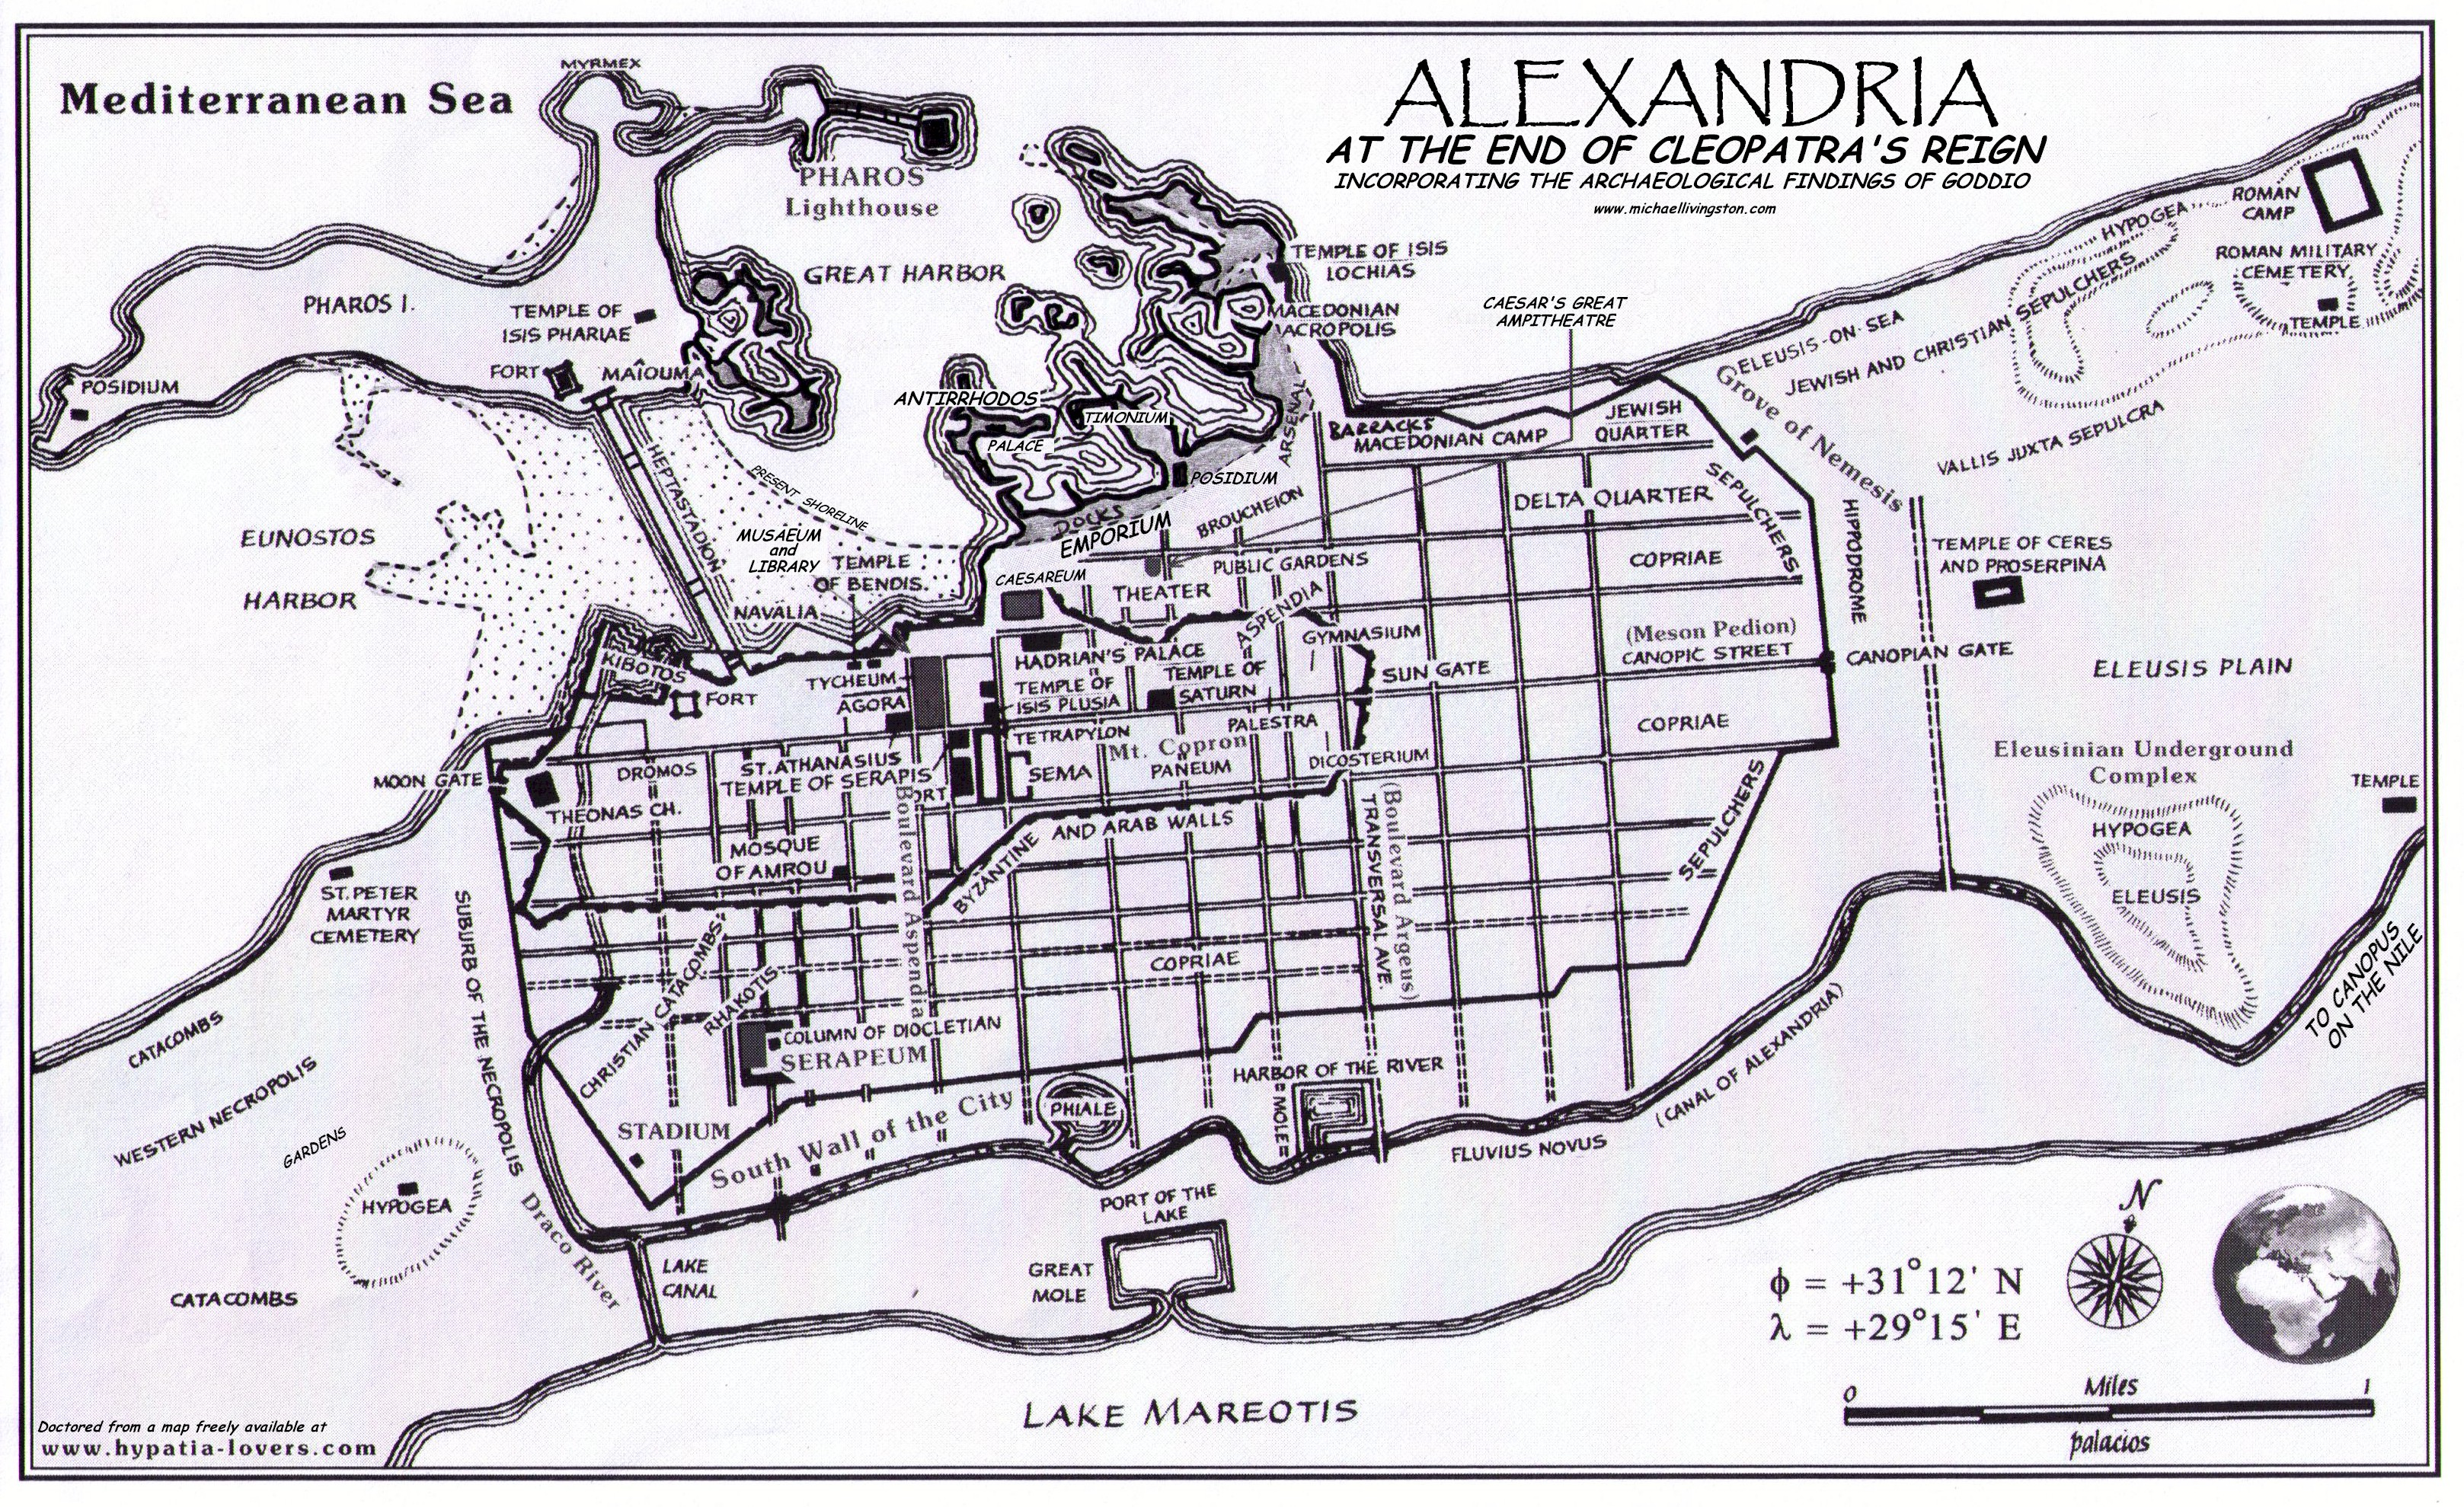 FileAlexandria Map testejpg Wikimedia Commons